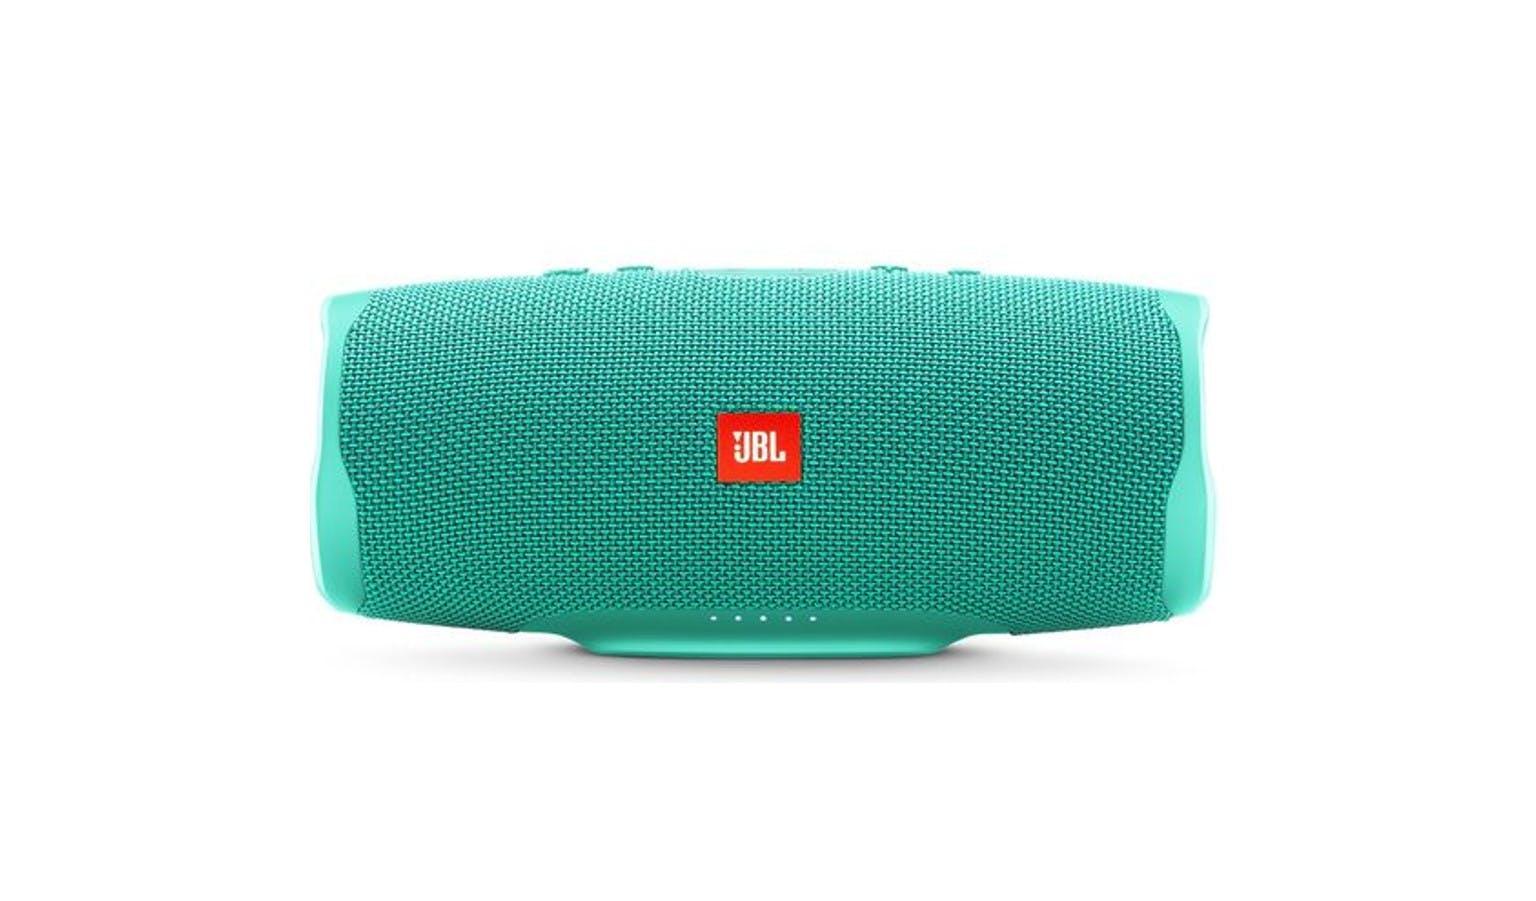 JBL Charger 4 Portable Bluetooth Speaker - Teal